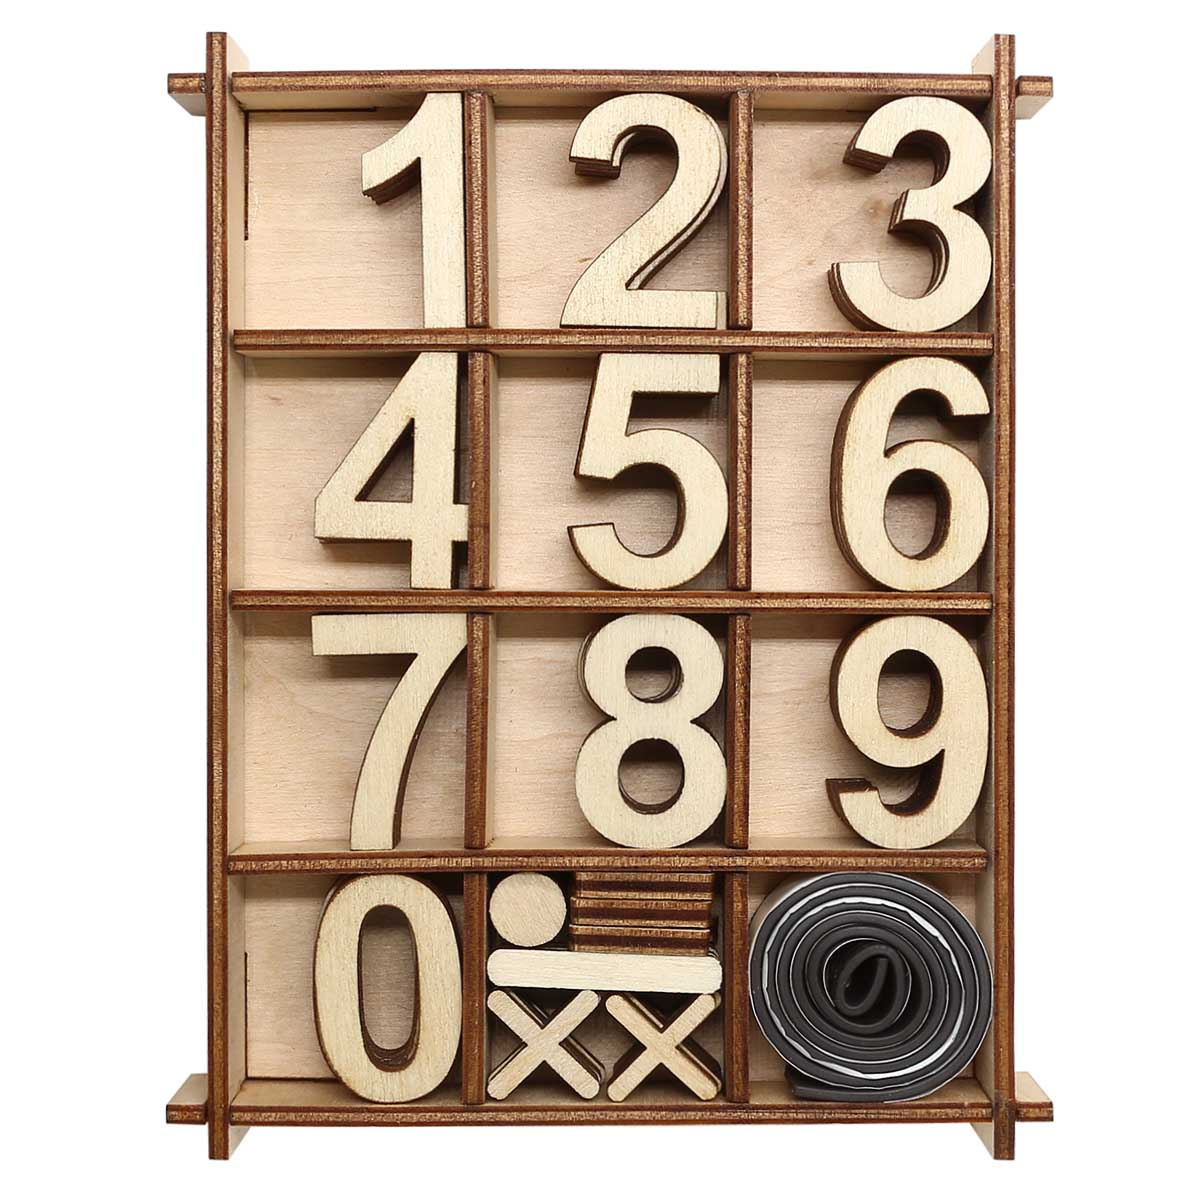 L-1175 Деревянная заготовка Набор цифр 48шт в коробке 11,3*14,6см Астра